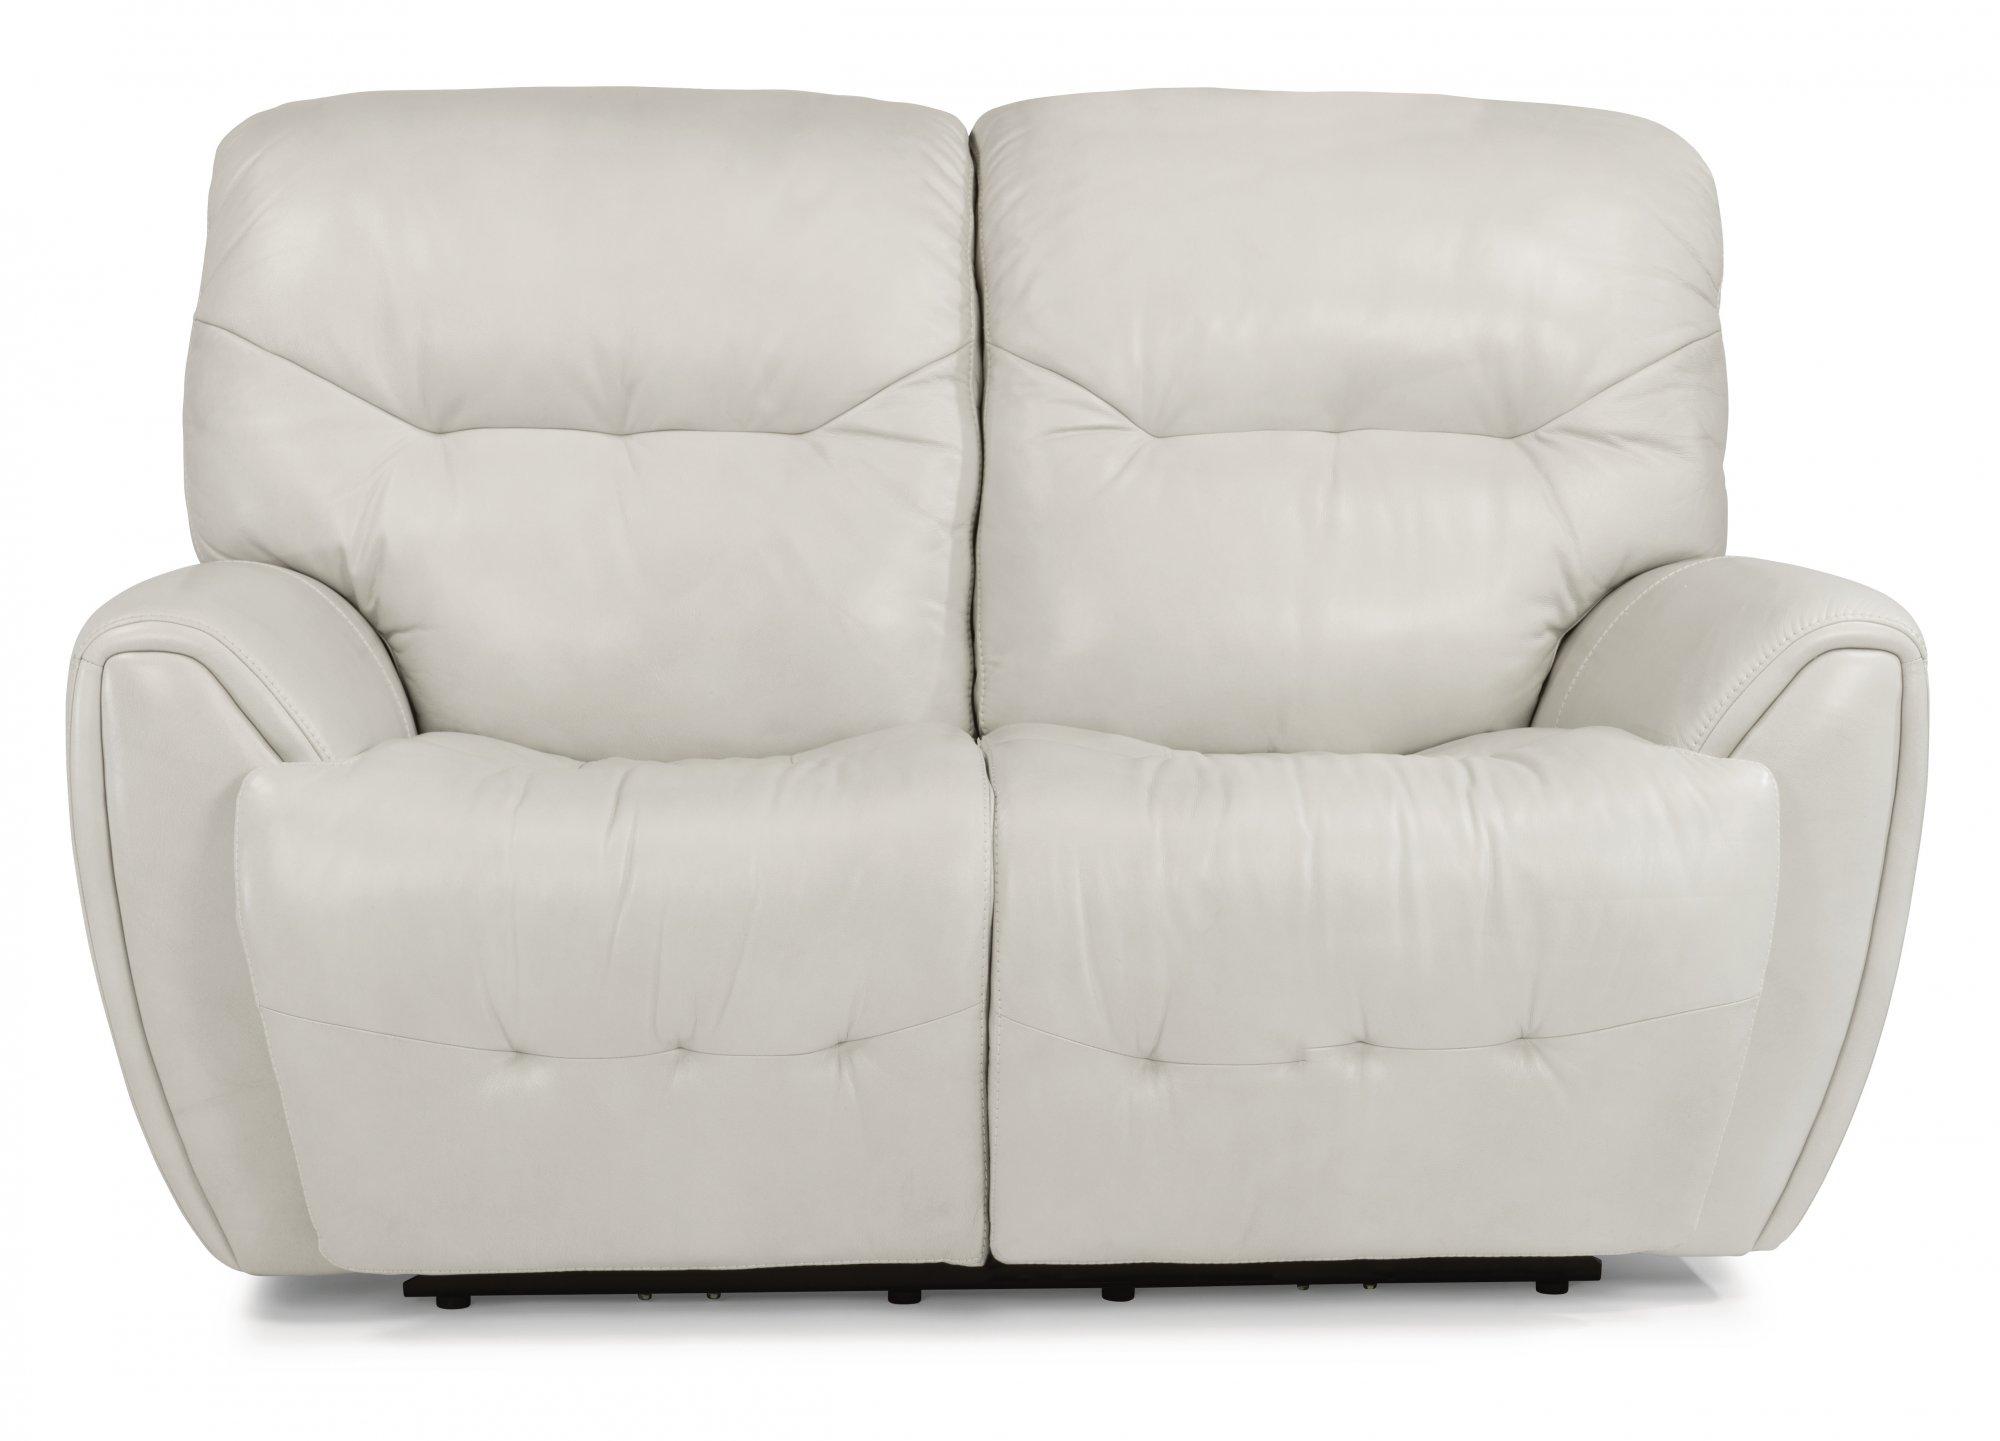 Brilliant Flexsteel Craig Appliance And Furniture Machost Co Dining Chair Design Ideas Machostcouk